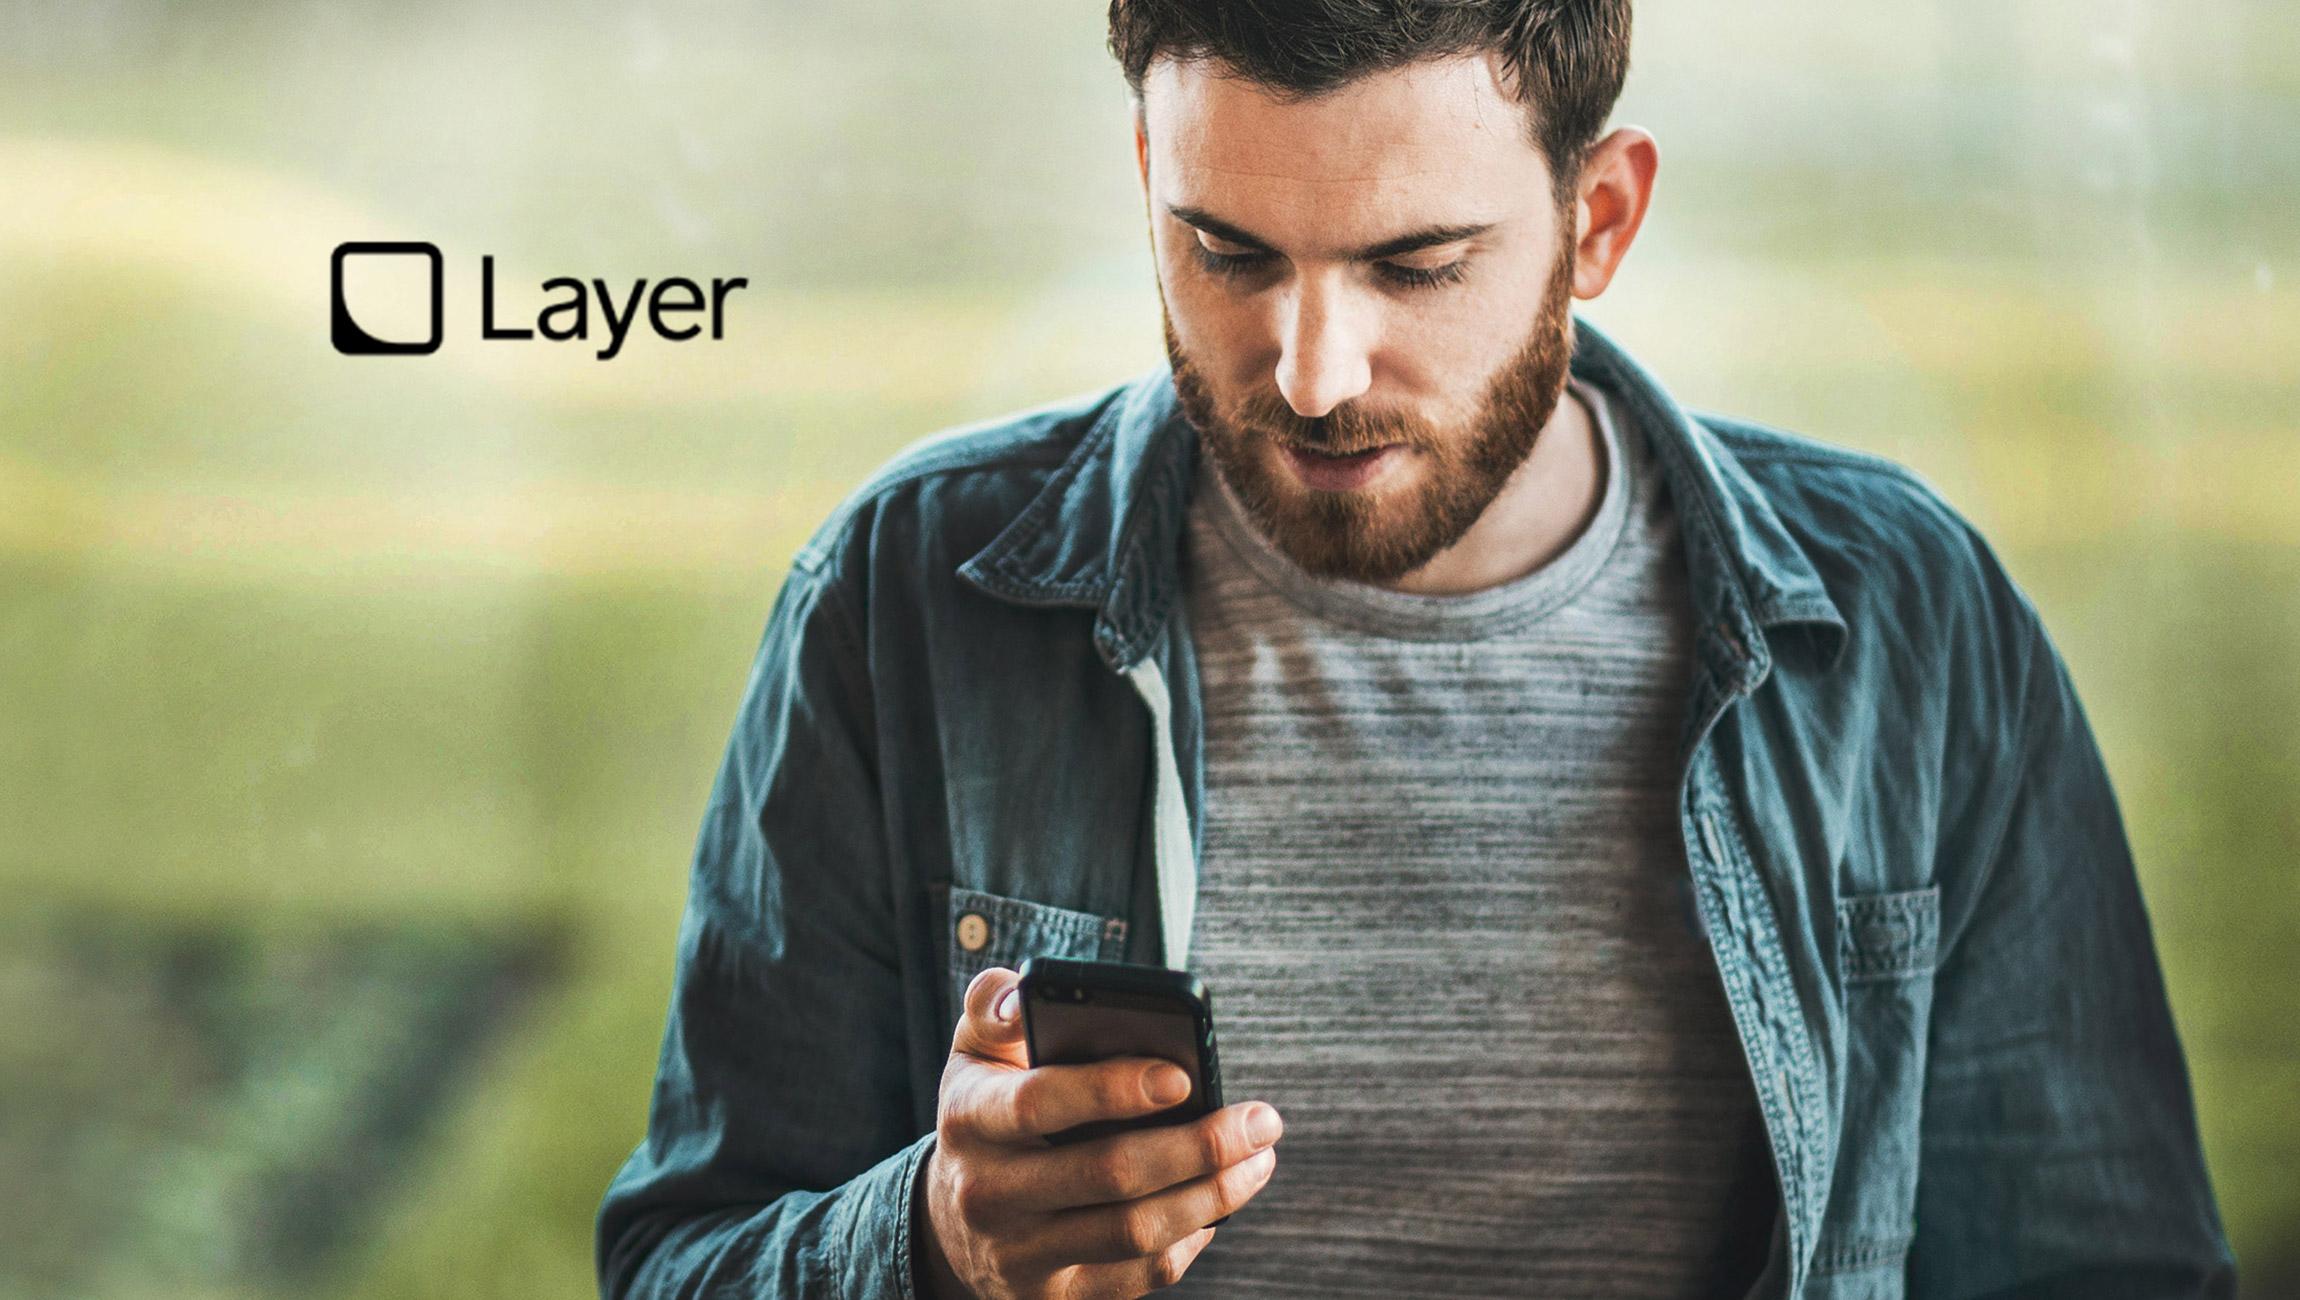 Swiggy's Chatbot, Powered By Layer's Conversation Platform, Sees High Customer Adoption